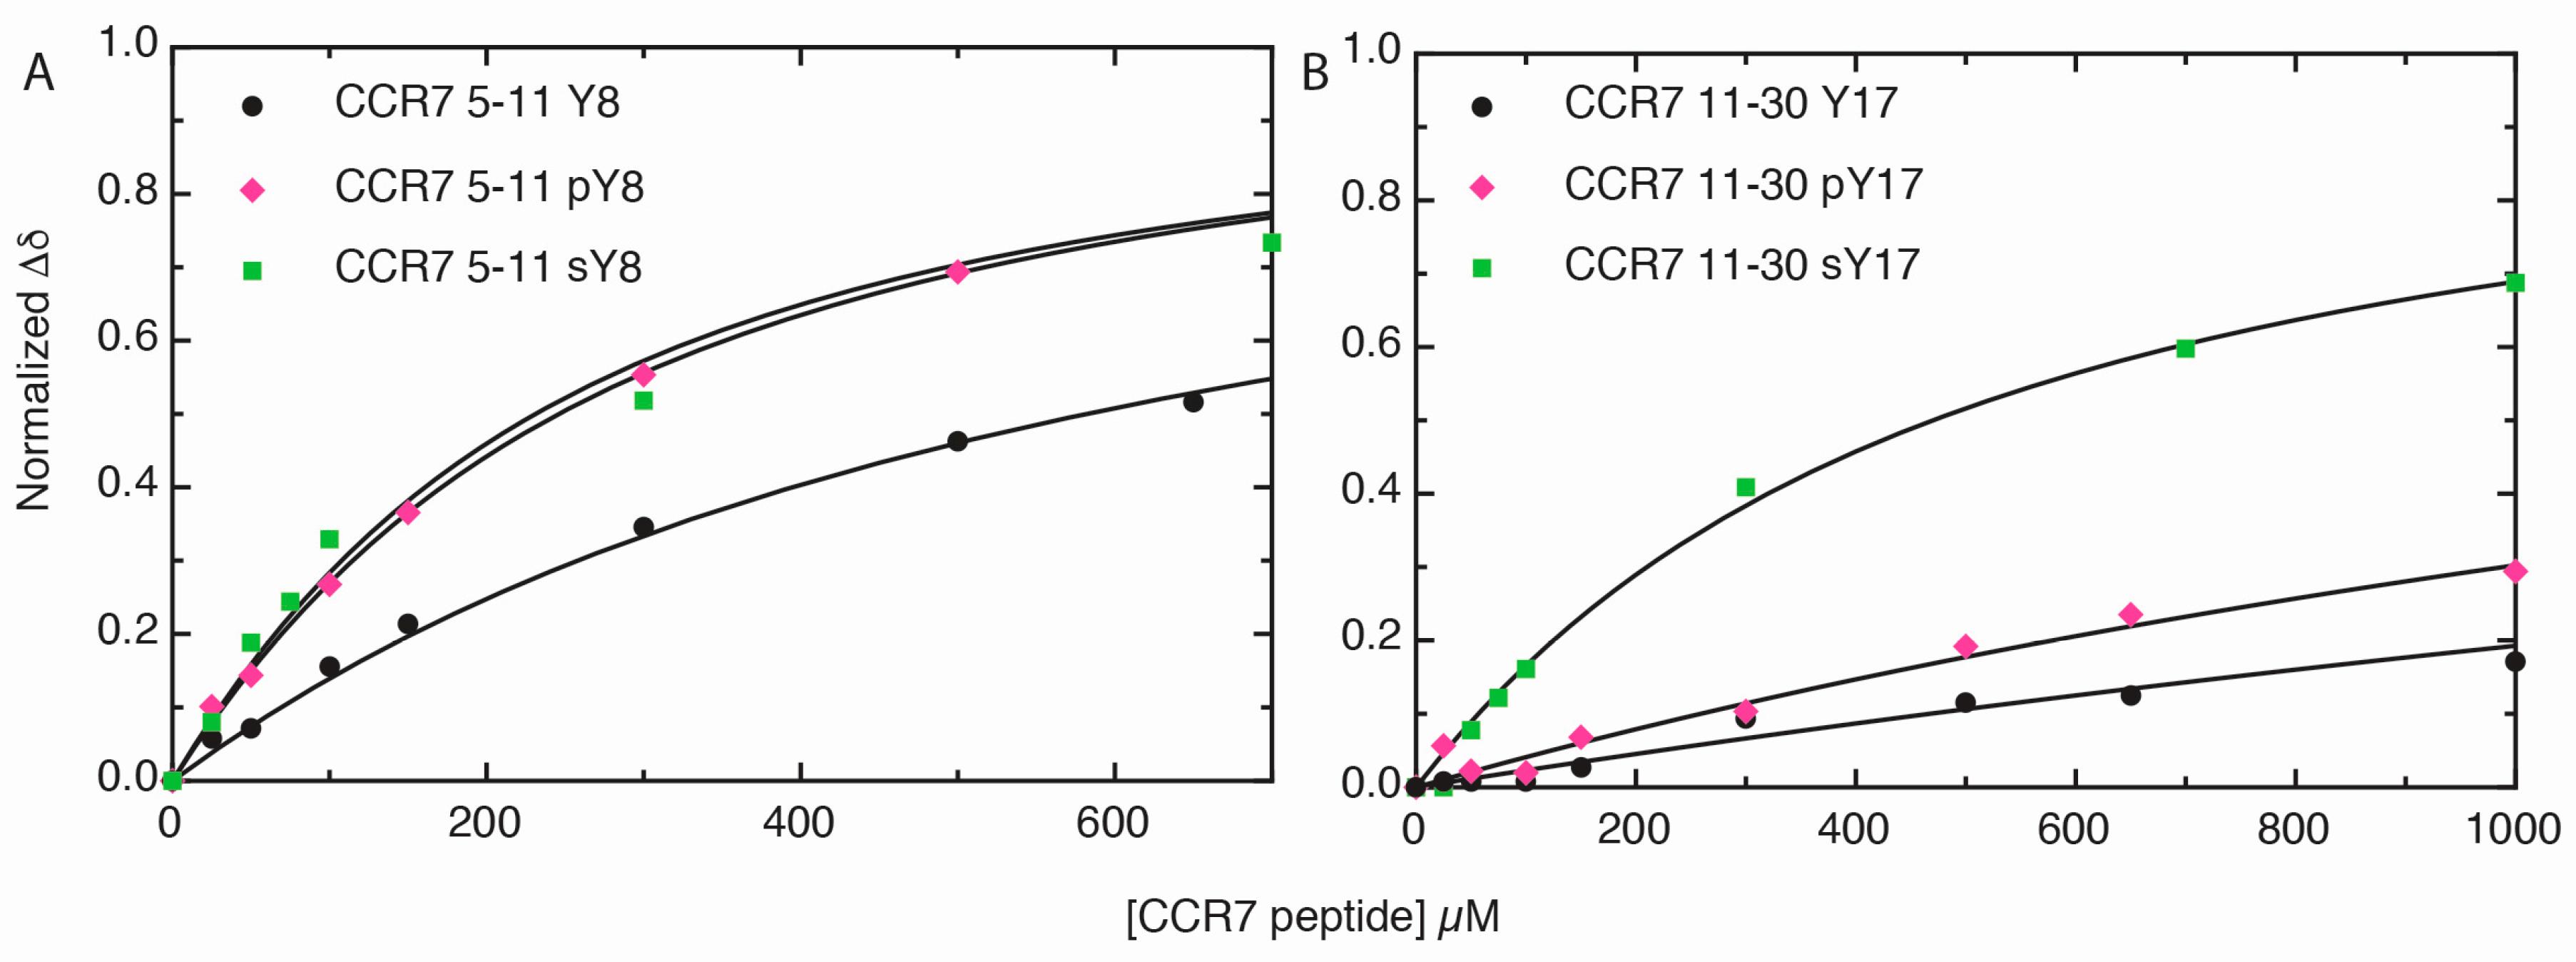 IJMS   Free Full-Text   CCR7 Sulfotyrosine Enhances CCL21